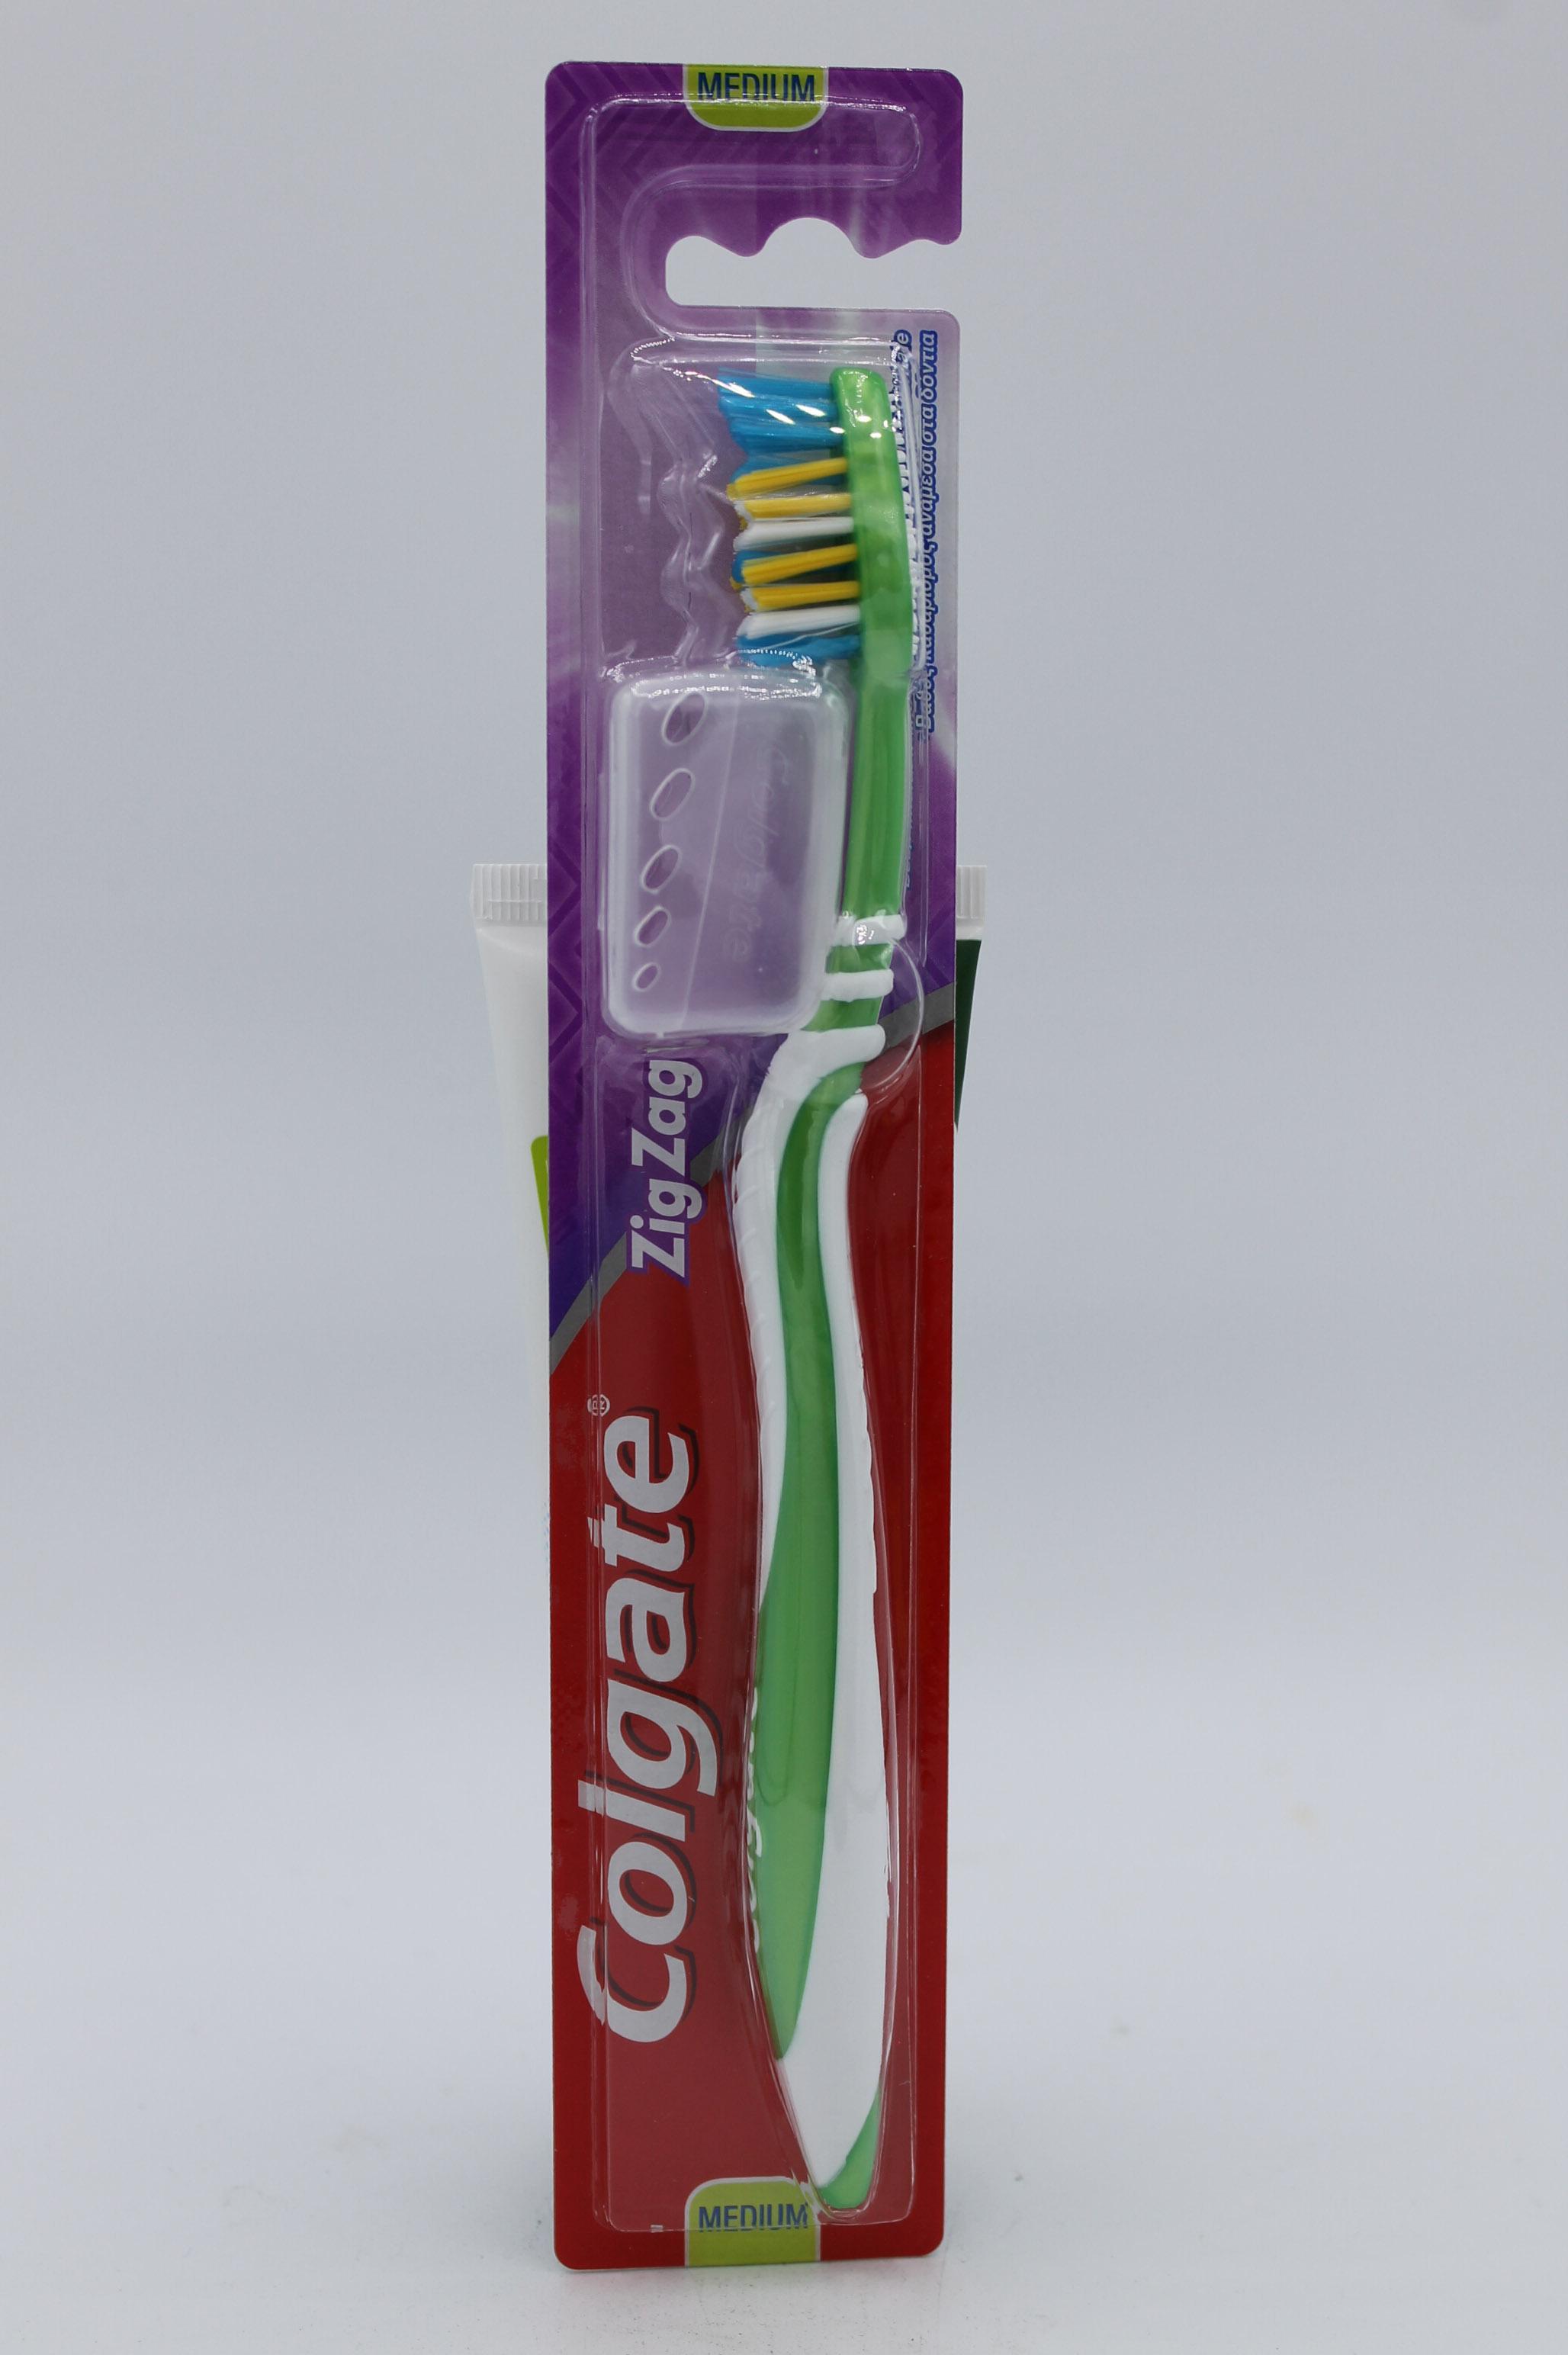 Colgate spazzolino setole medie 1pz.